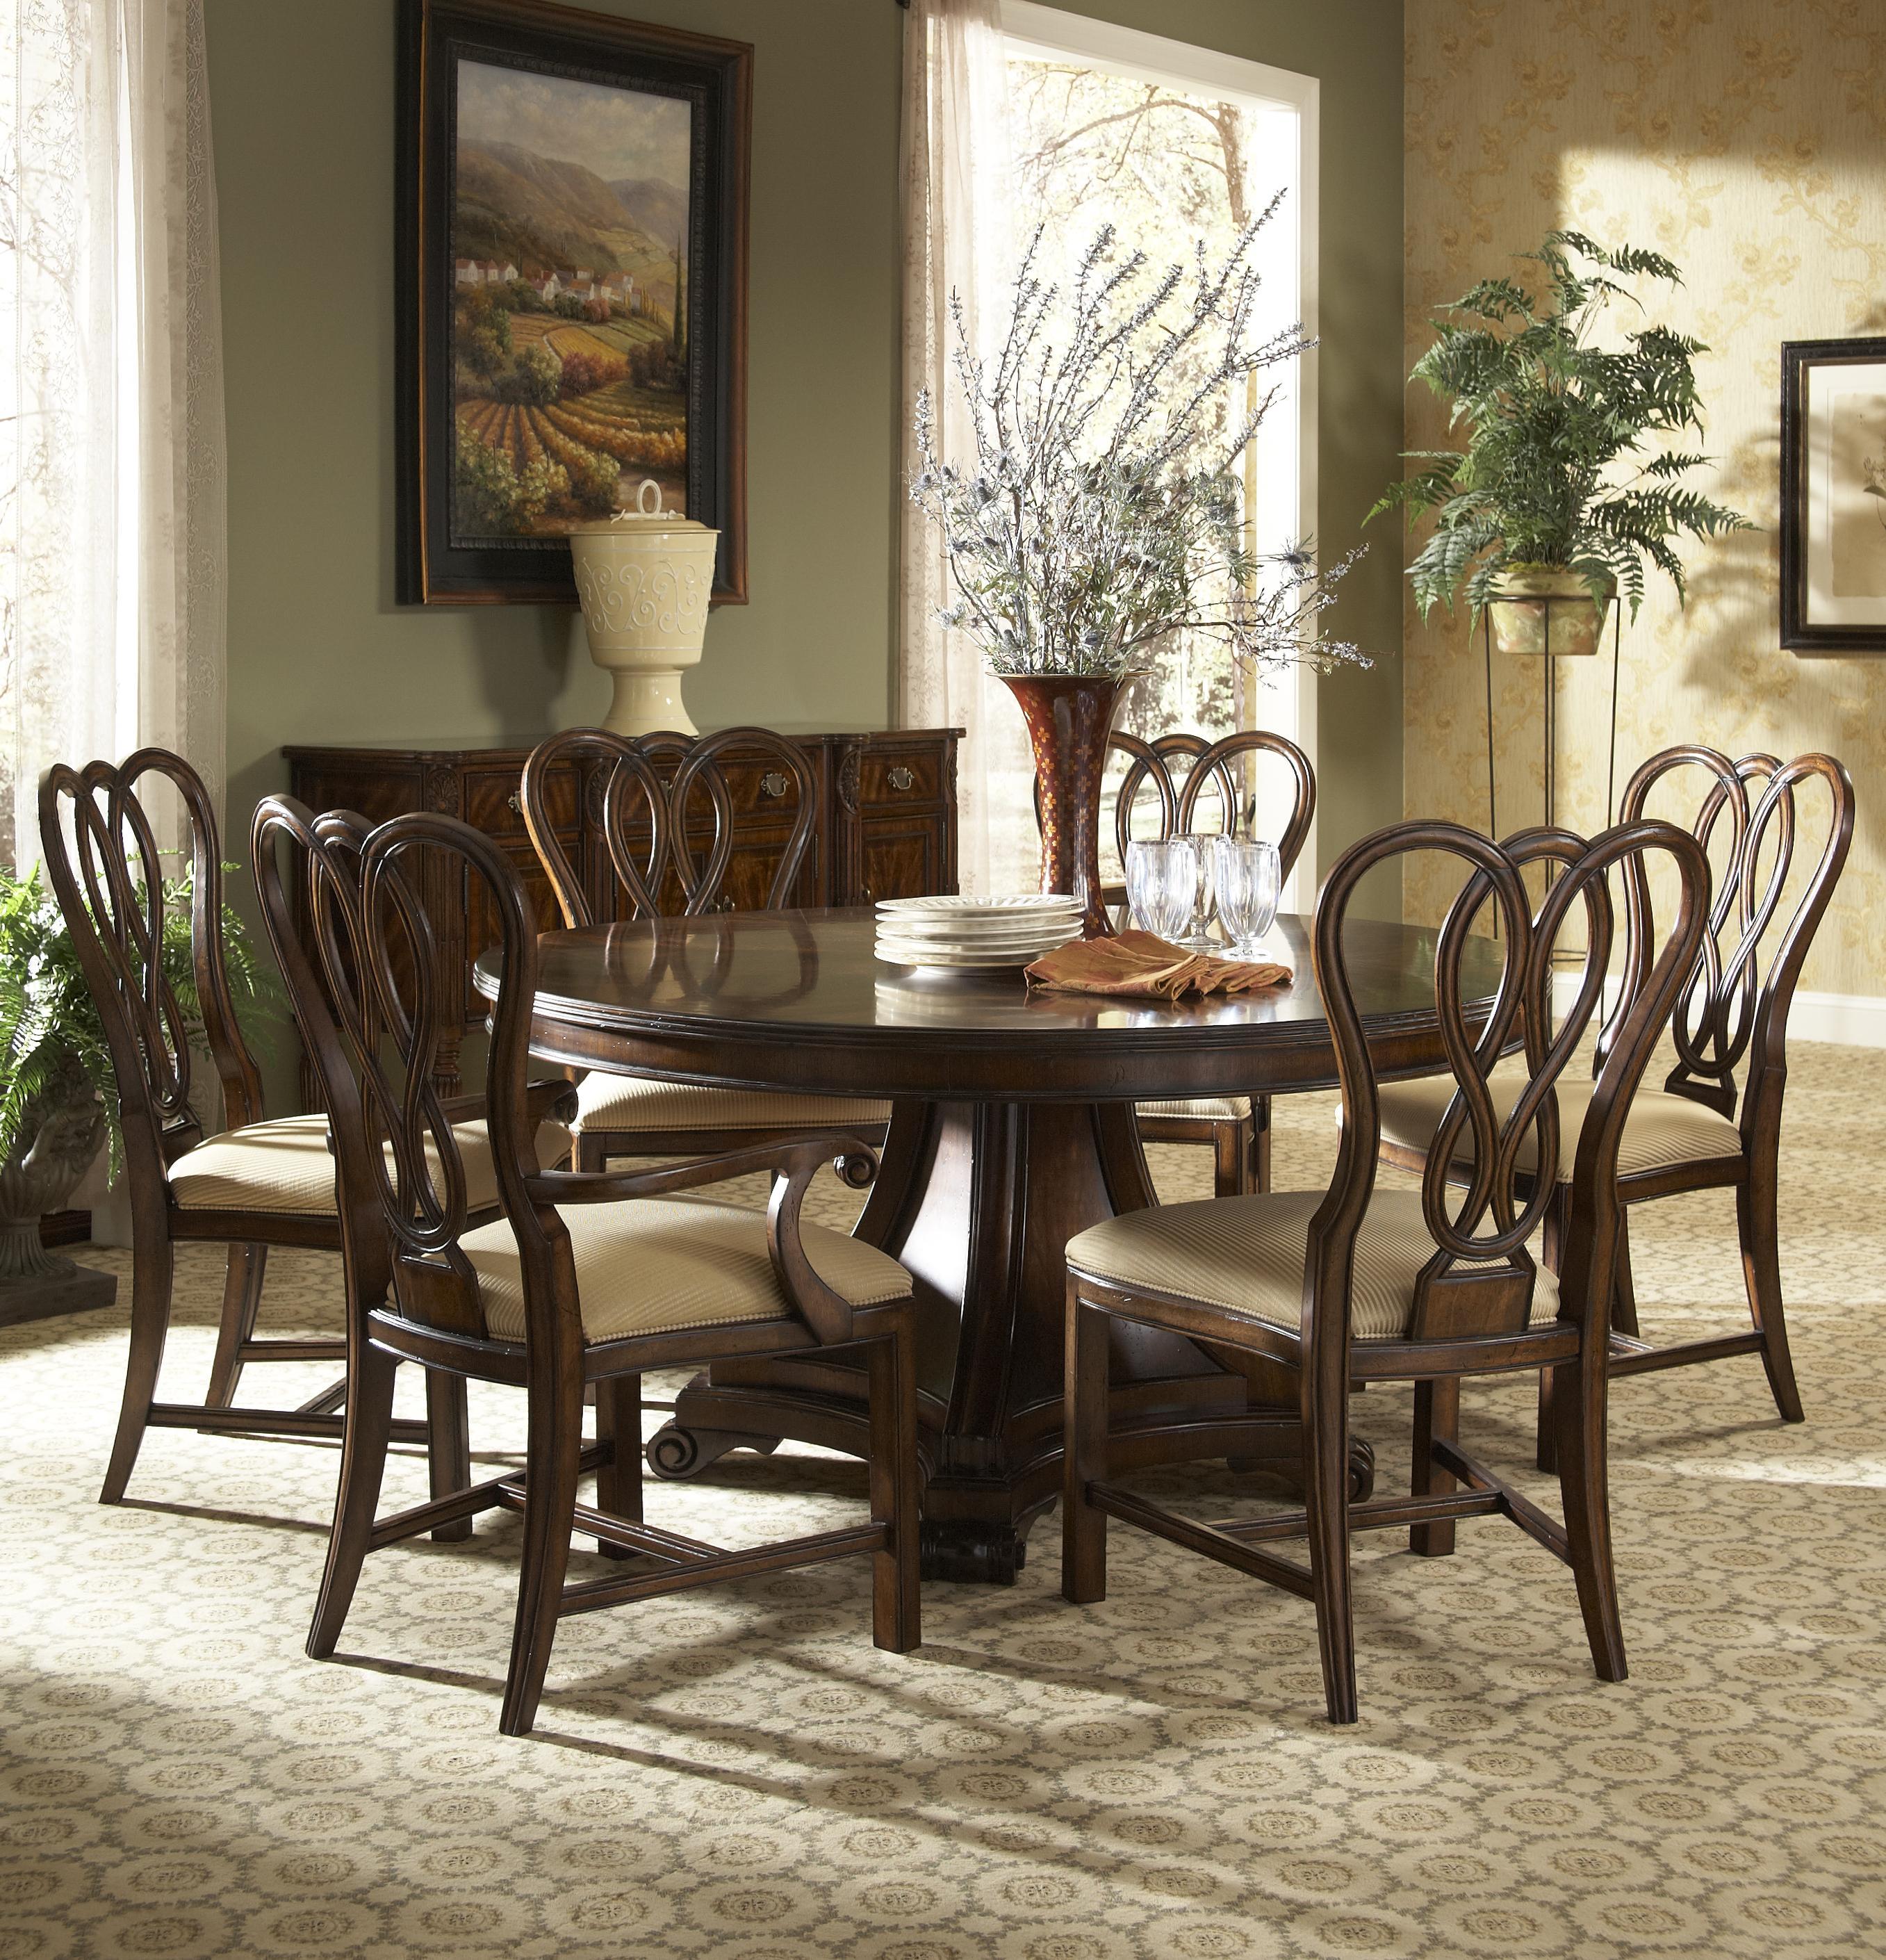 Upscale Dining Room Furniture: Fine Furniture Design Hyde Park Formal Dining Room Group